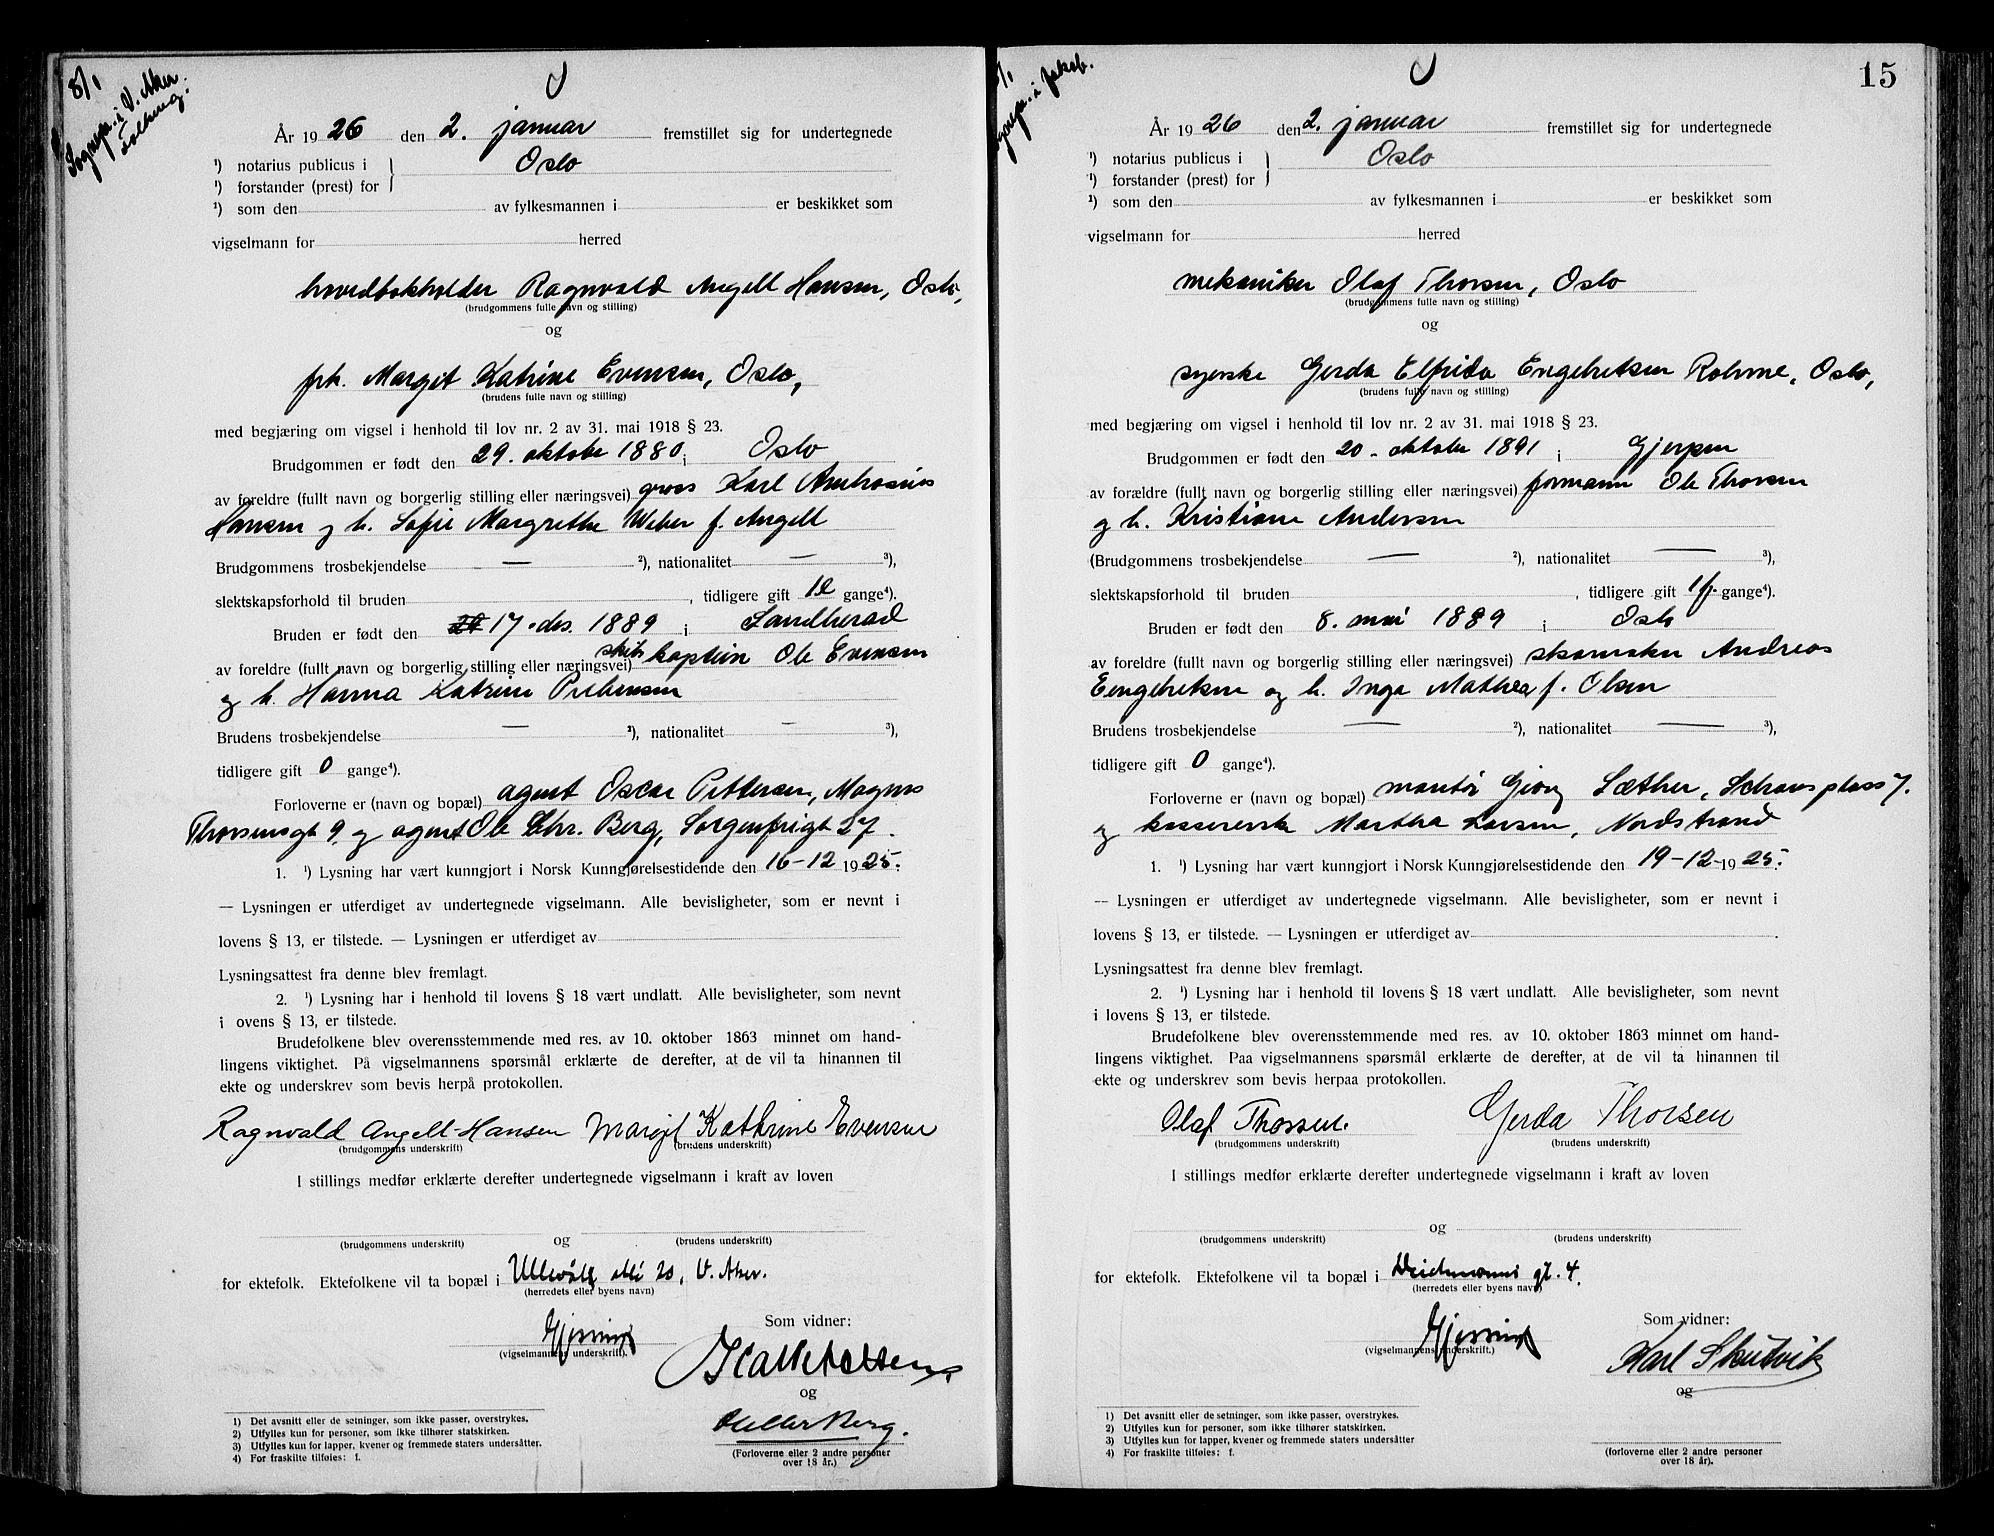 SAO, Oslo byfogd avd. I, L/Lb/Lbb/L0017: Notarialprotokoll, rekke II: Vigsler, 1924-1926, s. 14b-15a